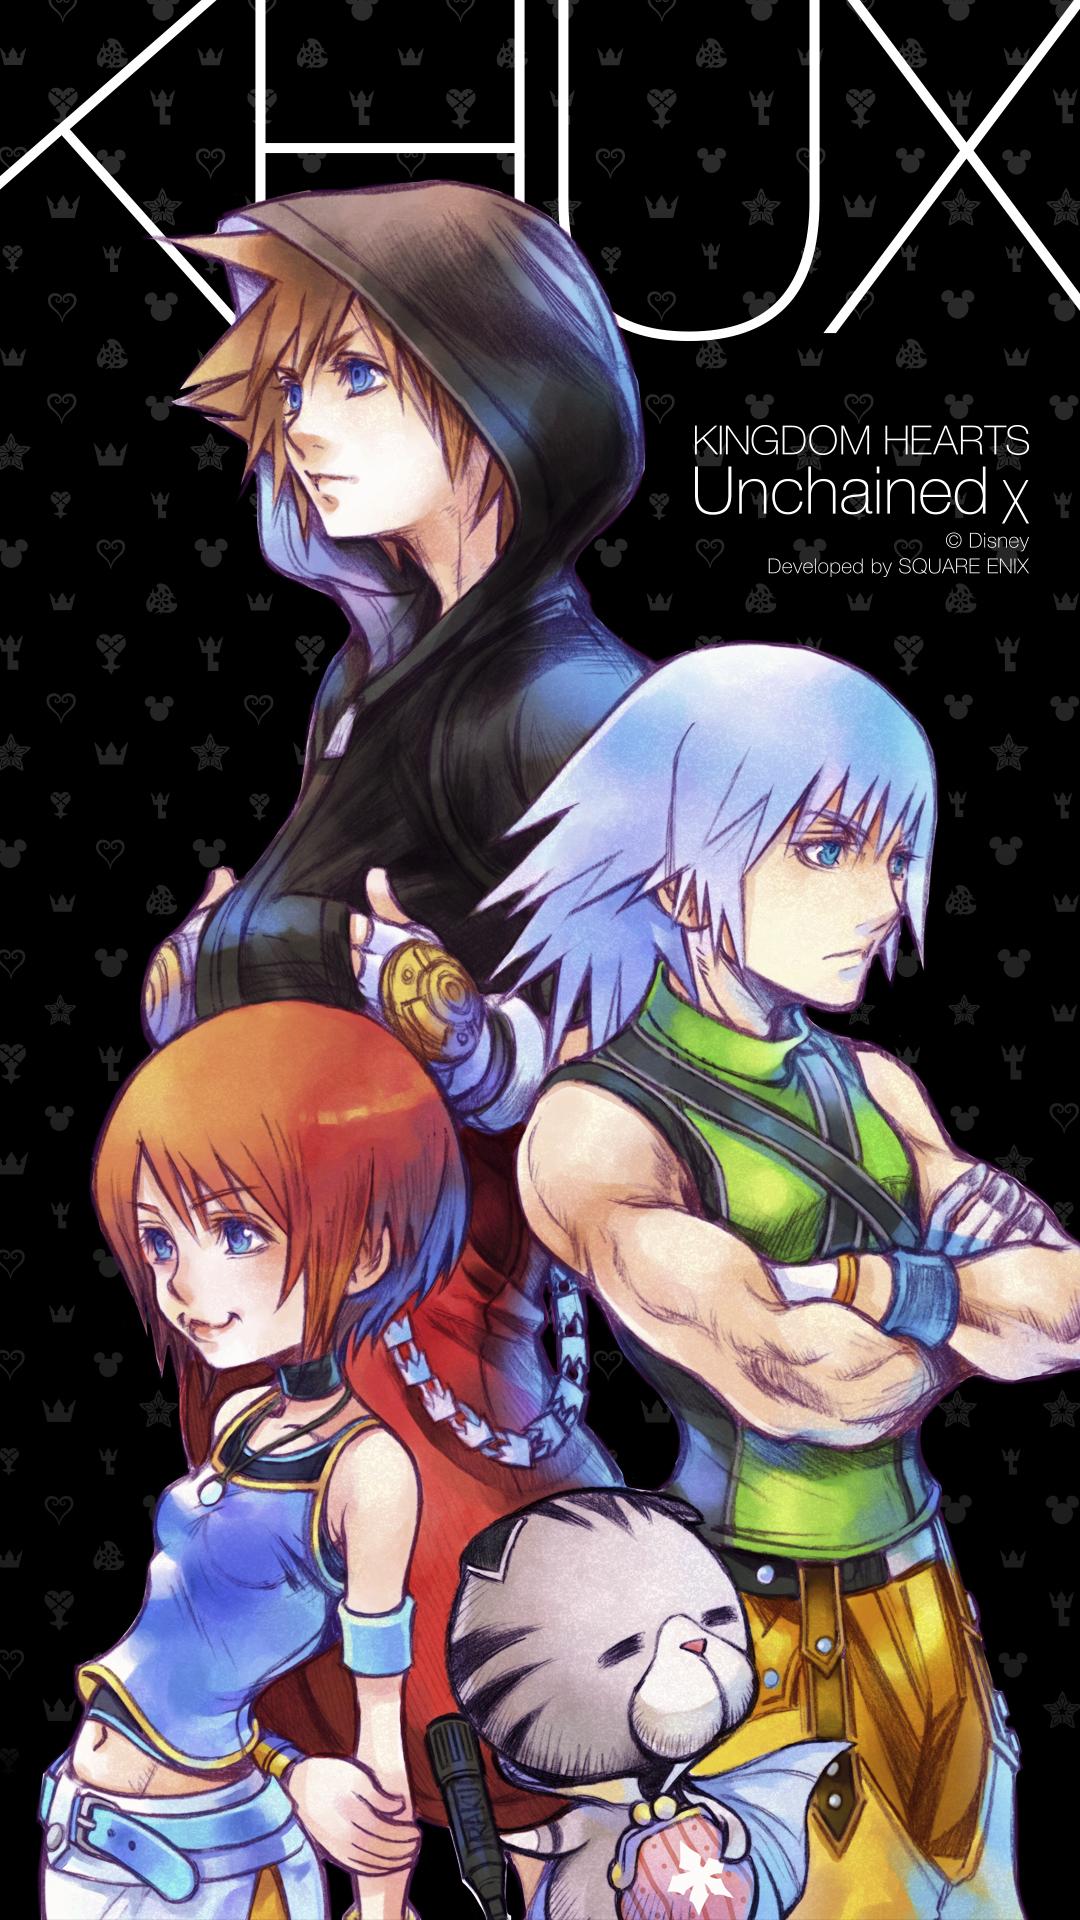 Wallpapers KINGDOM HEARTS Union Cross Kingdom Hearts Insider